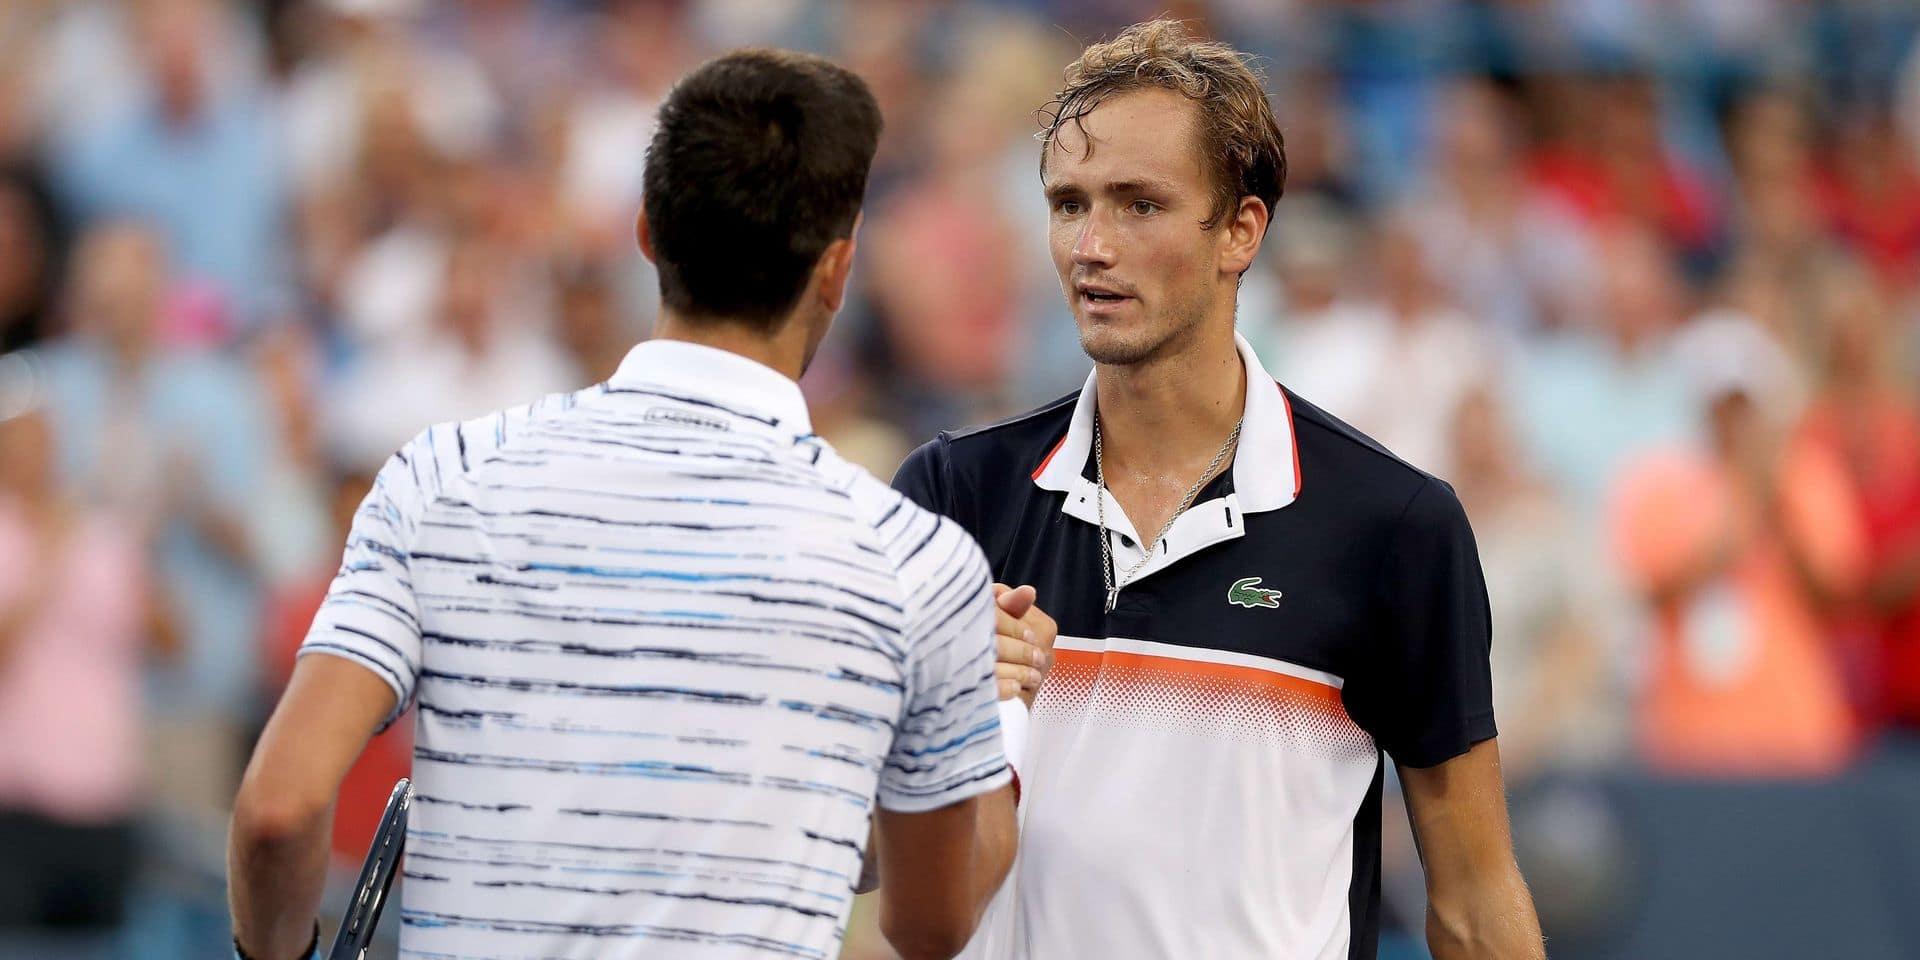 ATP Cincinnati: Djokovic éliminé en demi-finales par Medvedev